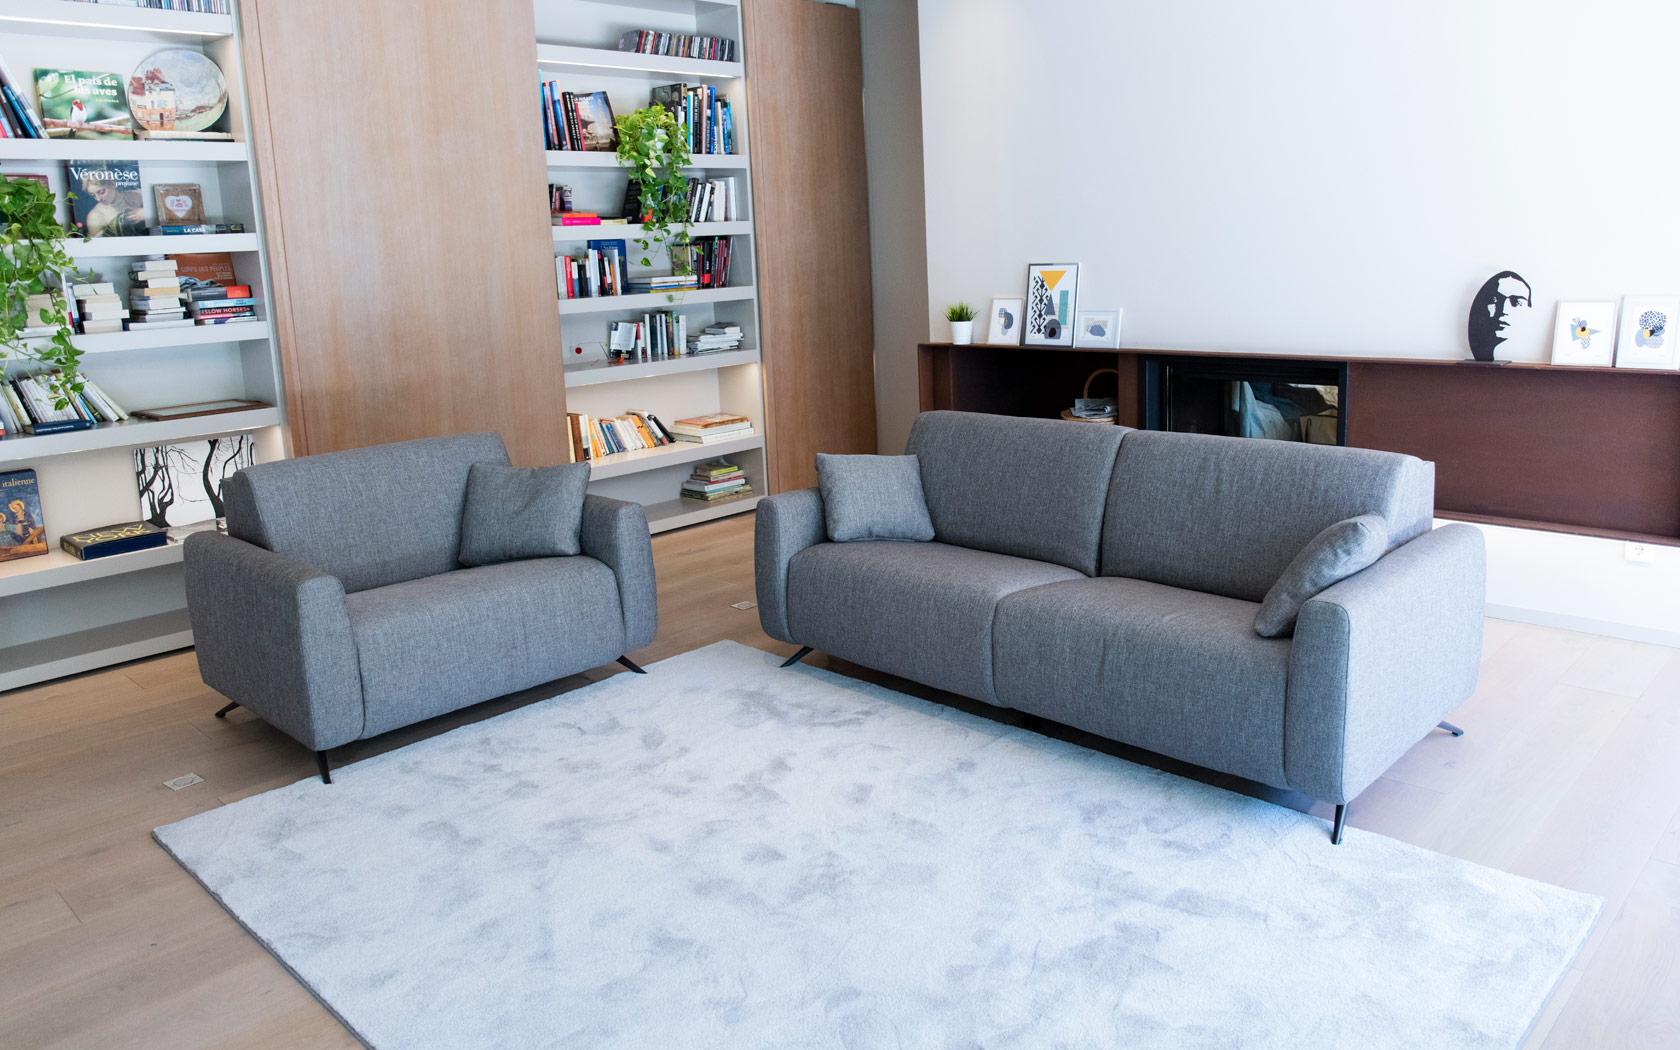 Atlanta sofa relax 2020 08